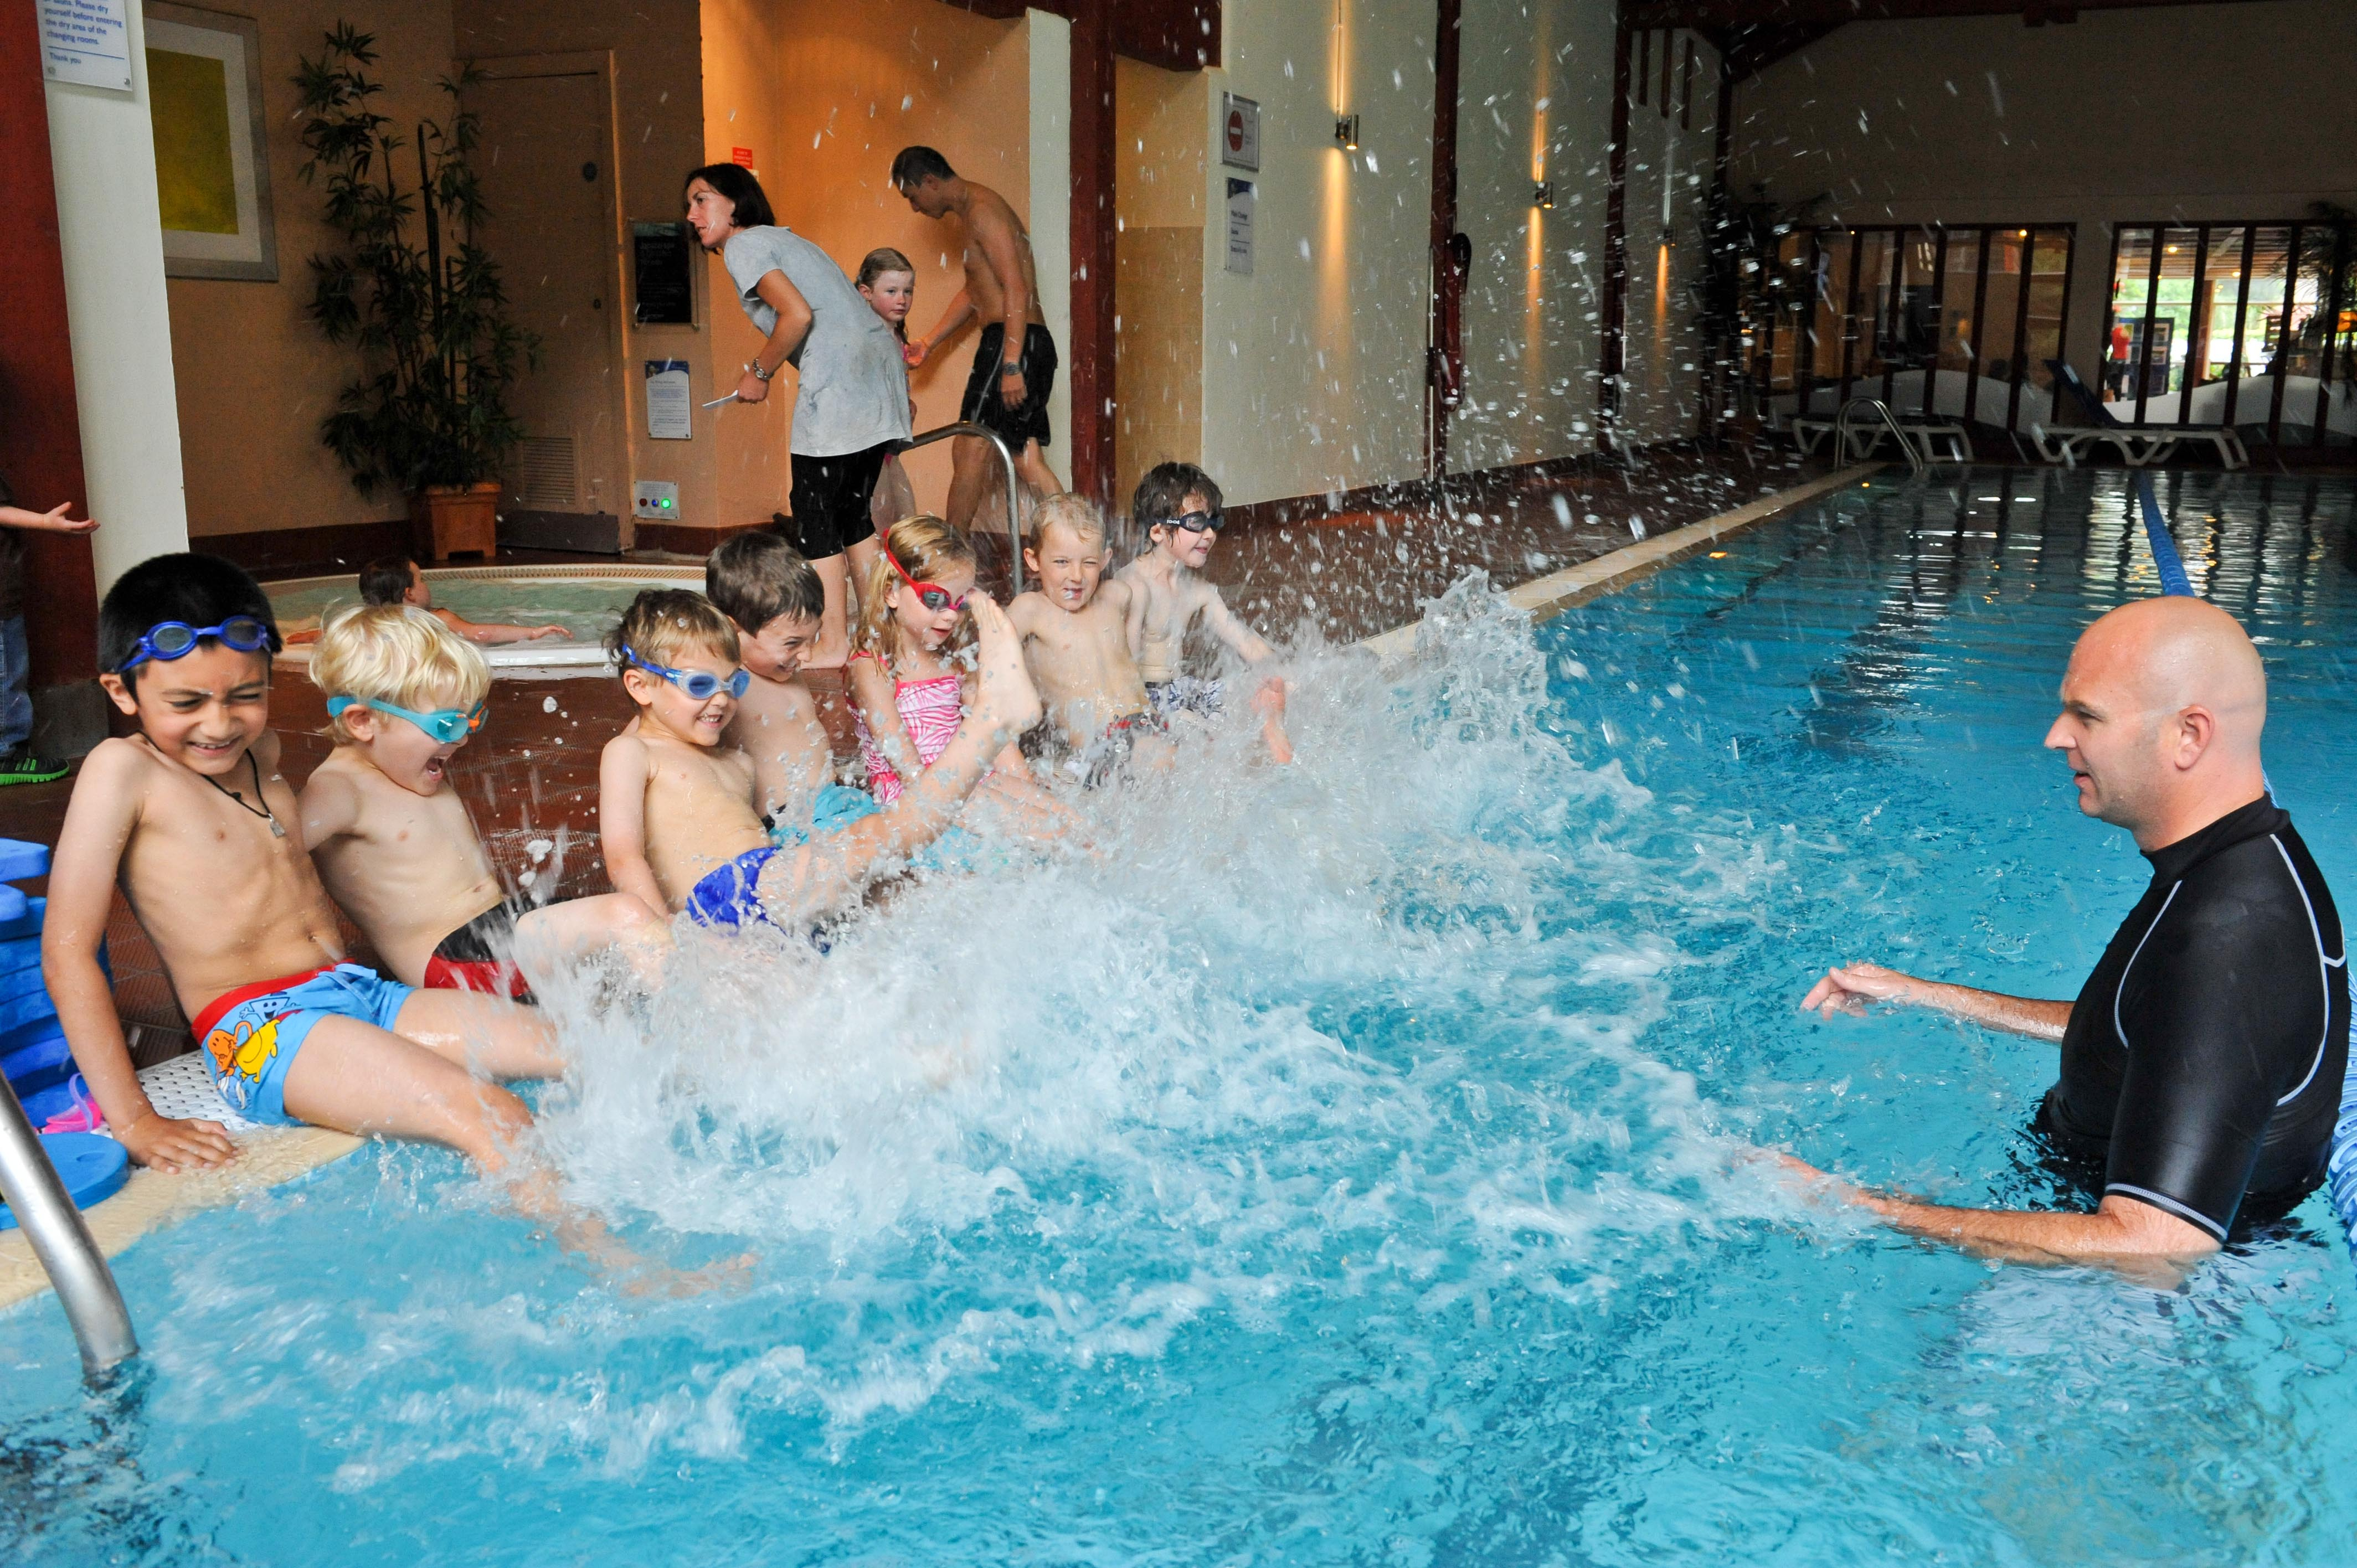 Swimtime to make a splash at new swimming pool in Garforth